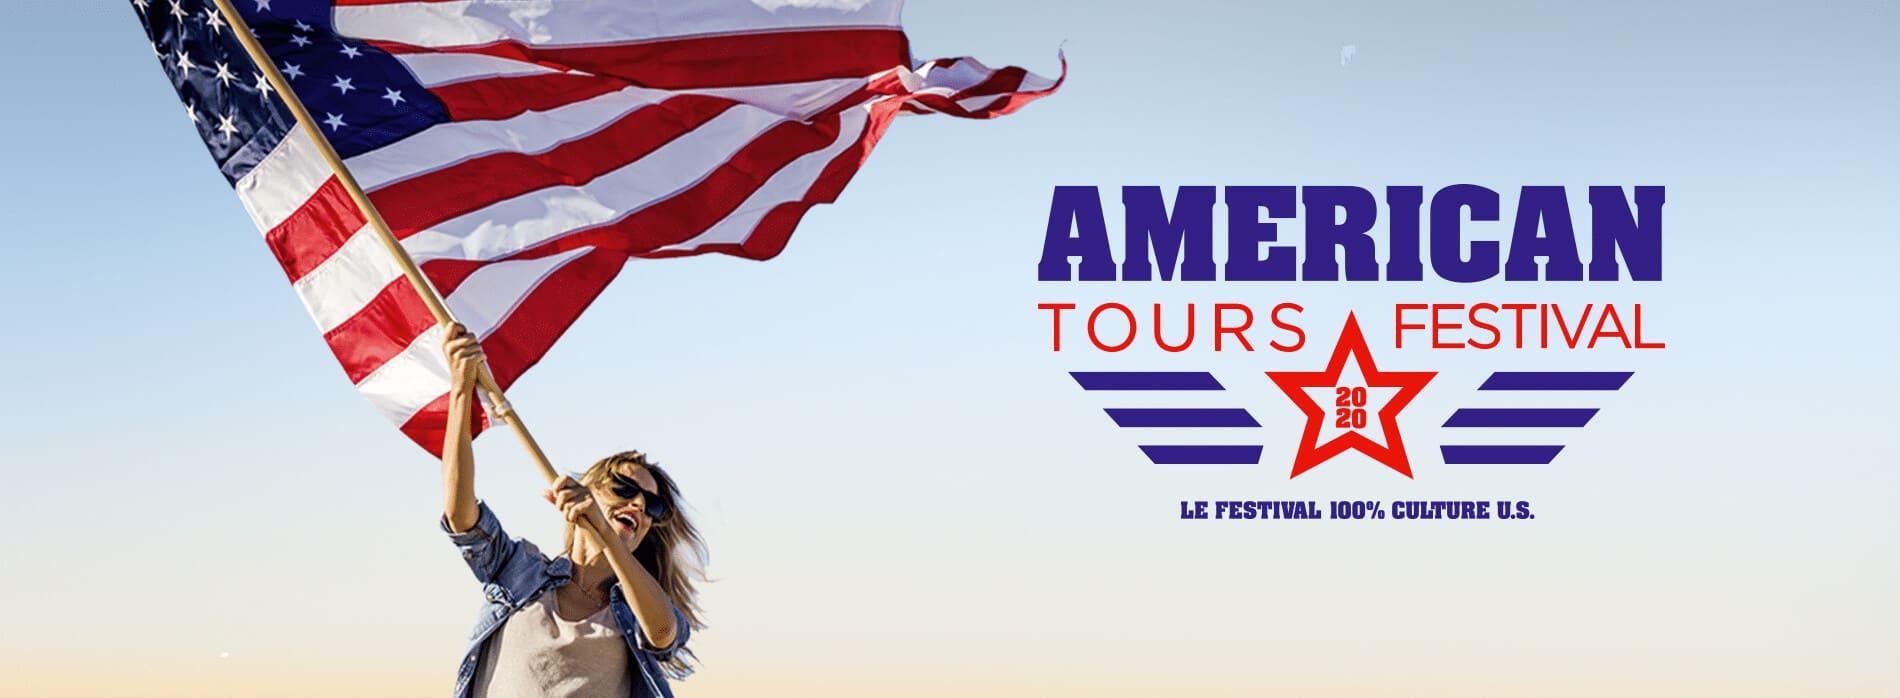 American Tours Festival